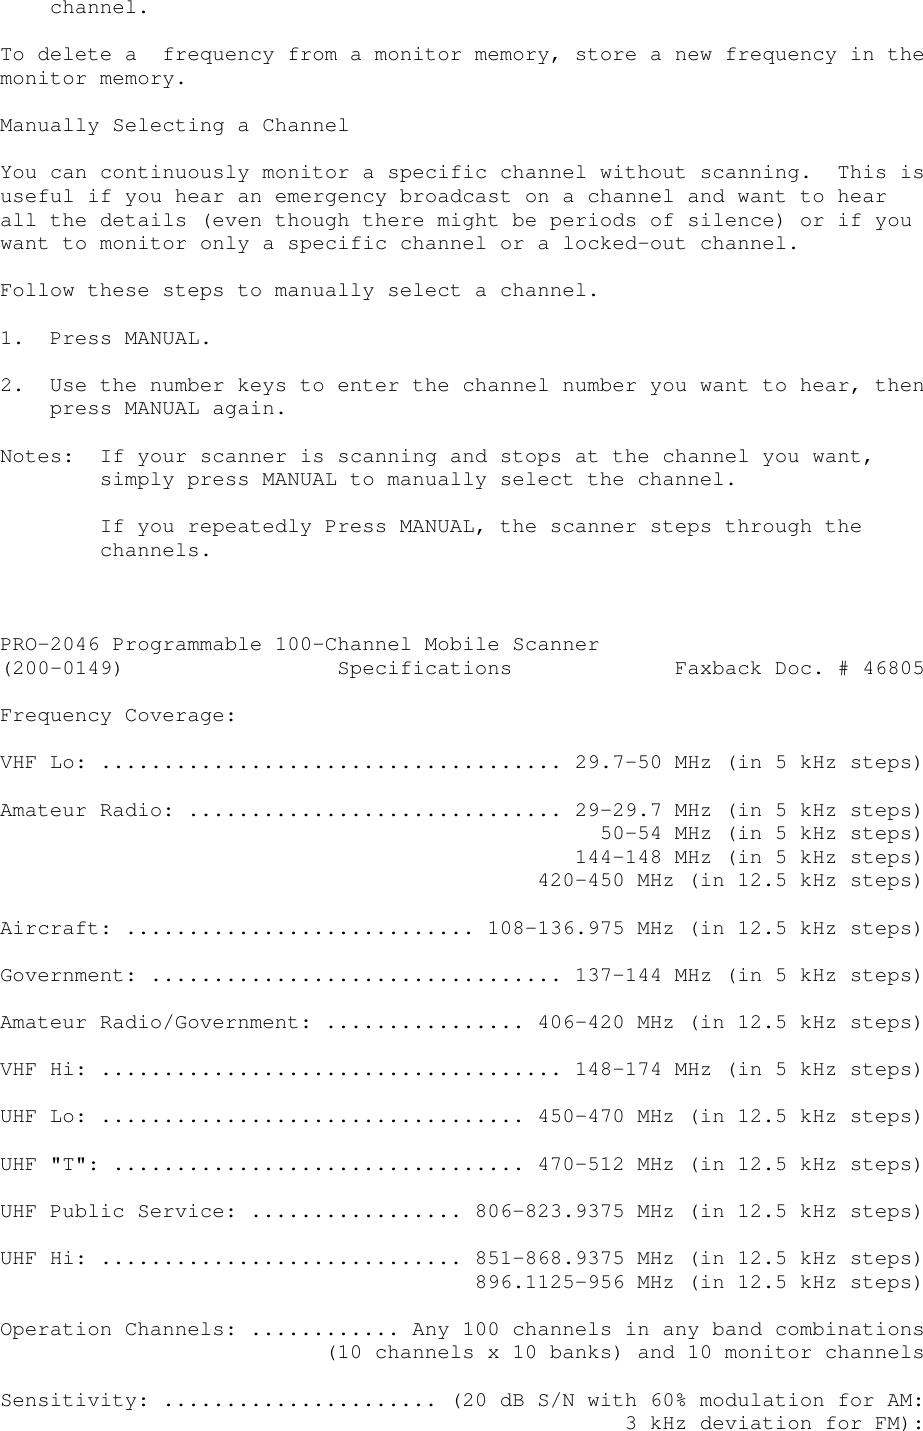 Radio Shack Pro 2046 Users Manual New _2_